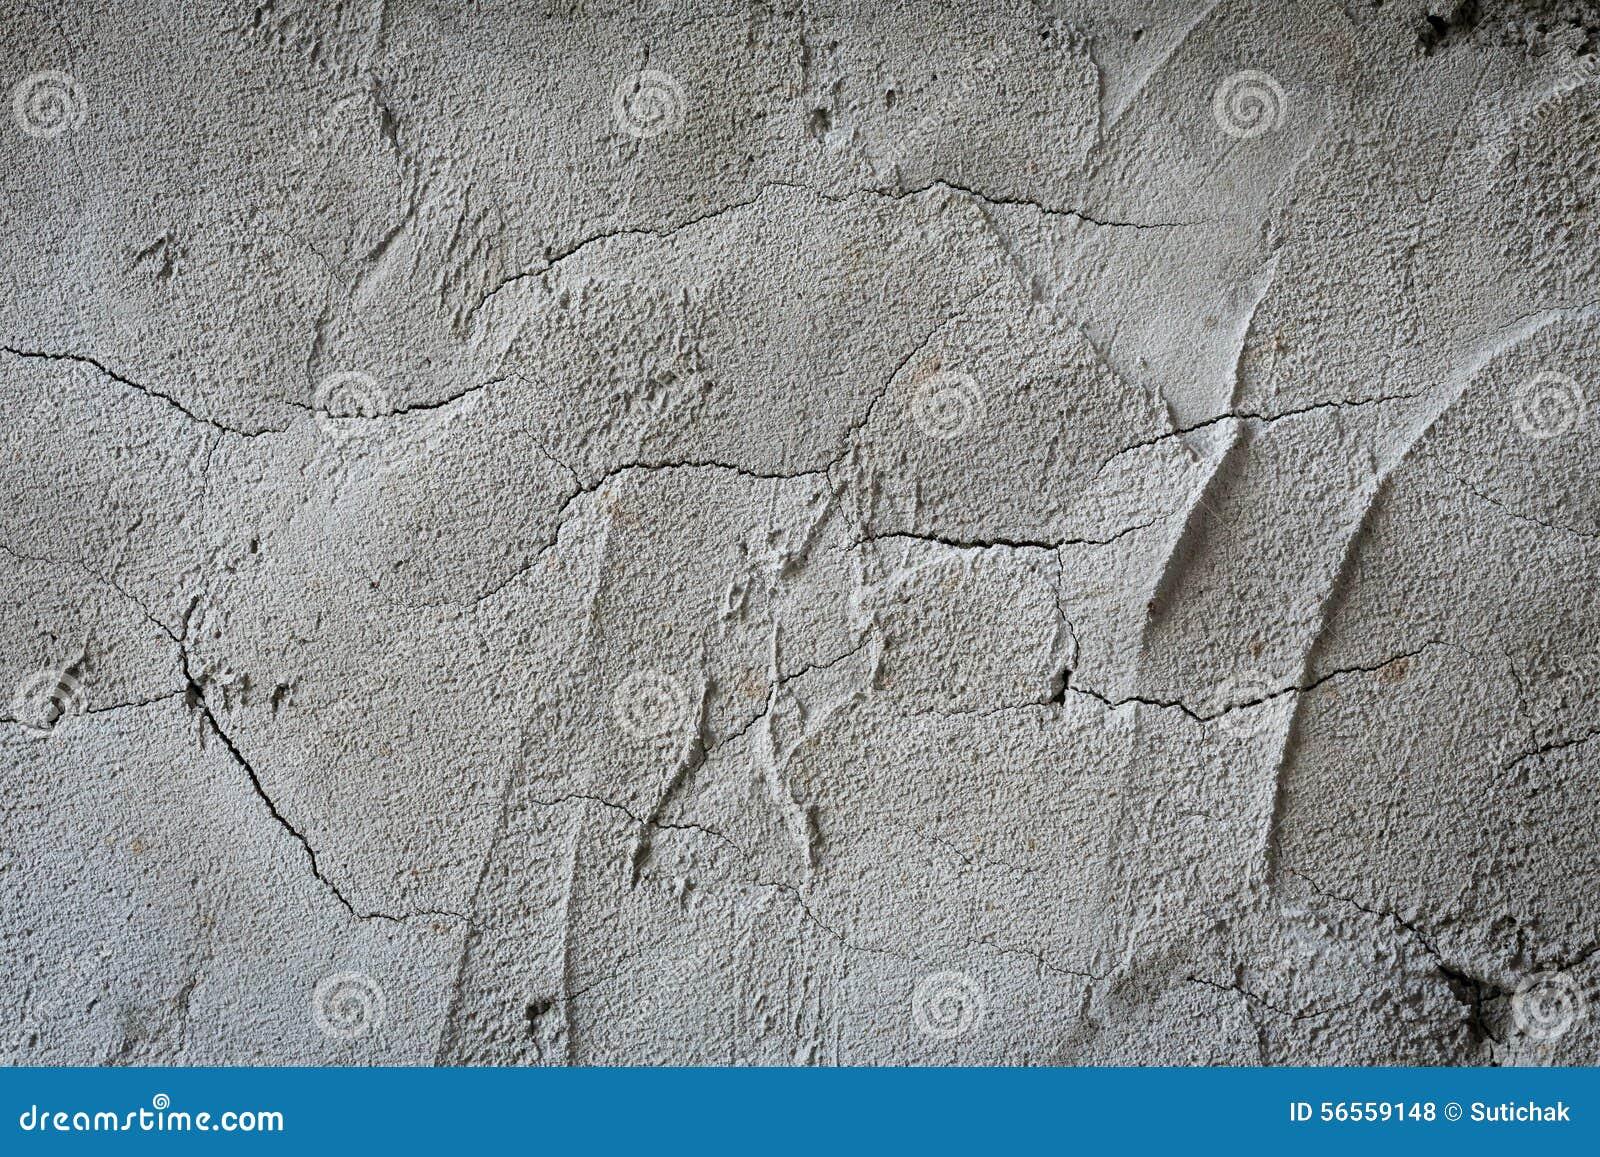 Download Σύσταση τοίχων τσιμέντου, τραχύ συγκεκριμένο Grunge Στοκ Εικόνες - εικόνα από συγκεκριμένος, grunge: 56559148